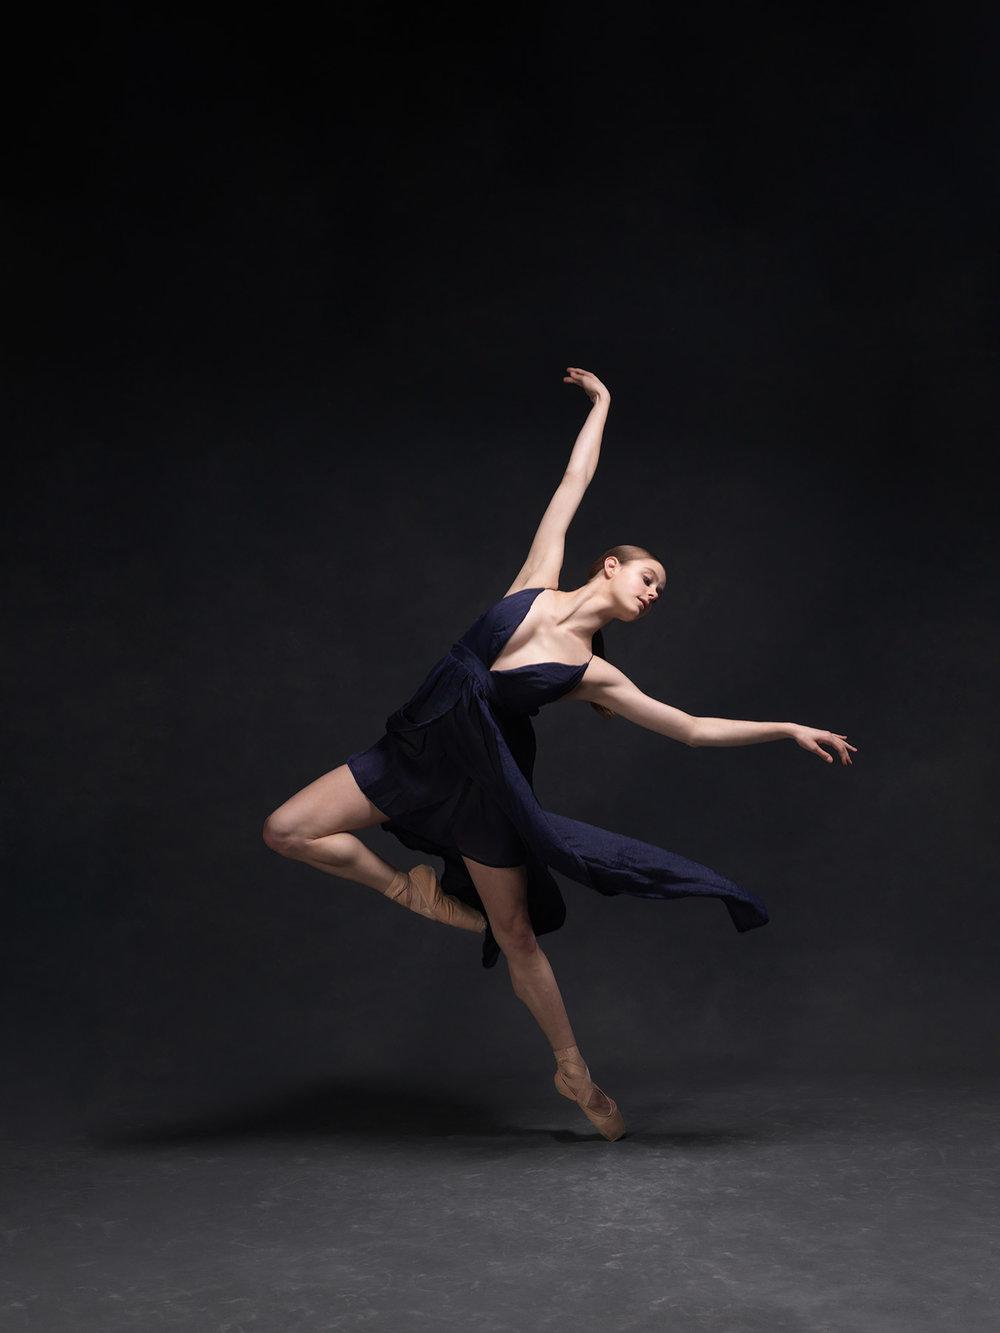 Tessa Puttick. National Dance Theatre of Australia. 2018.